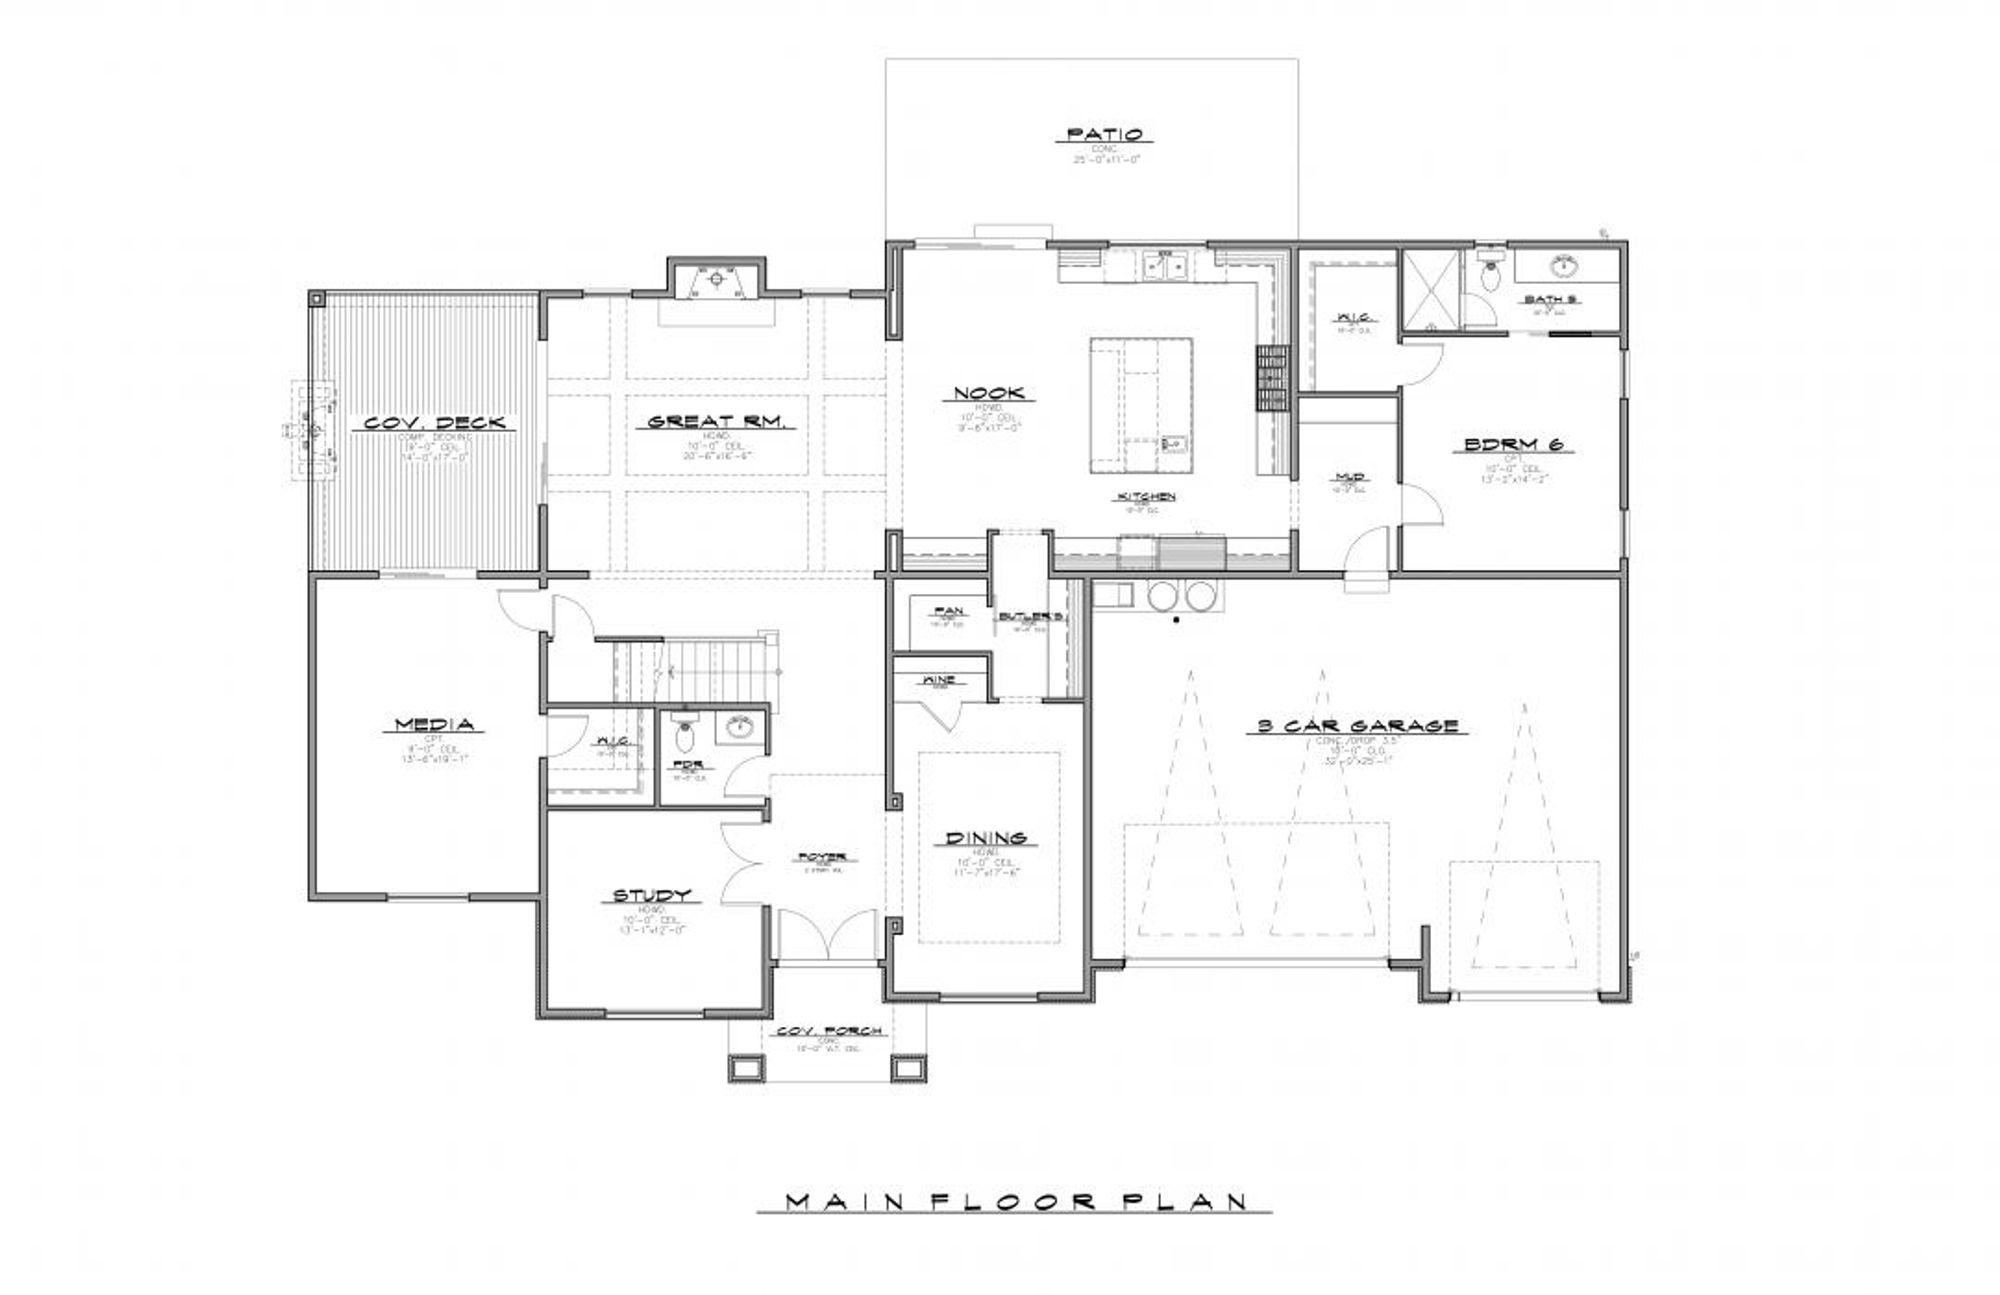 Perth Main Floor Plan